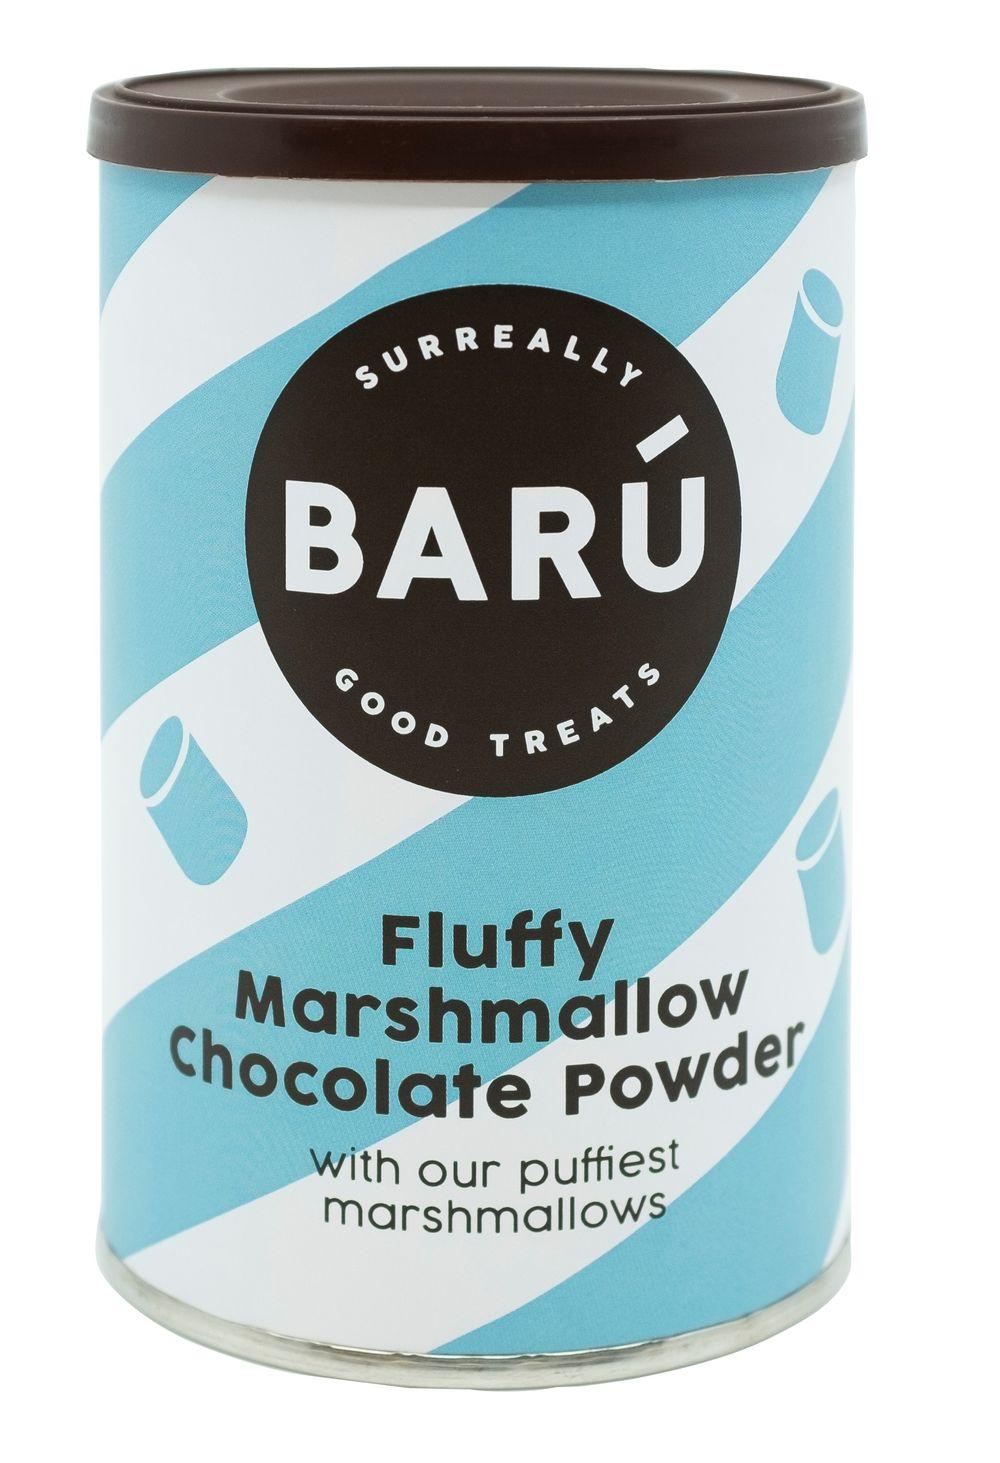 Fluffy Marshmallow Chocolate Powder